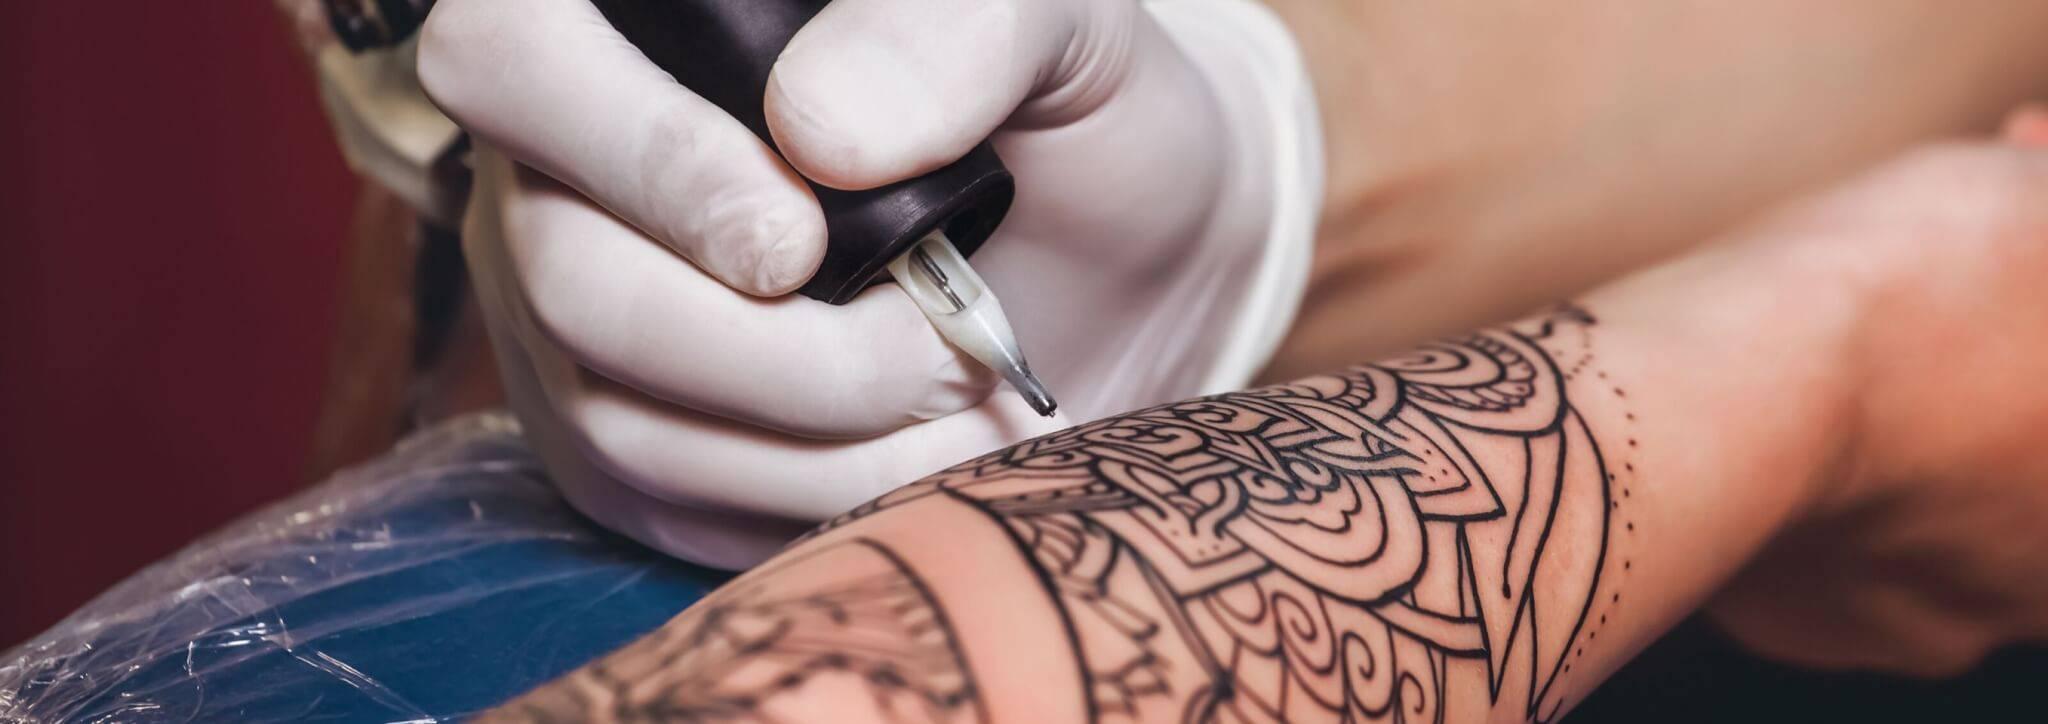 tattoeages infectie